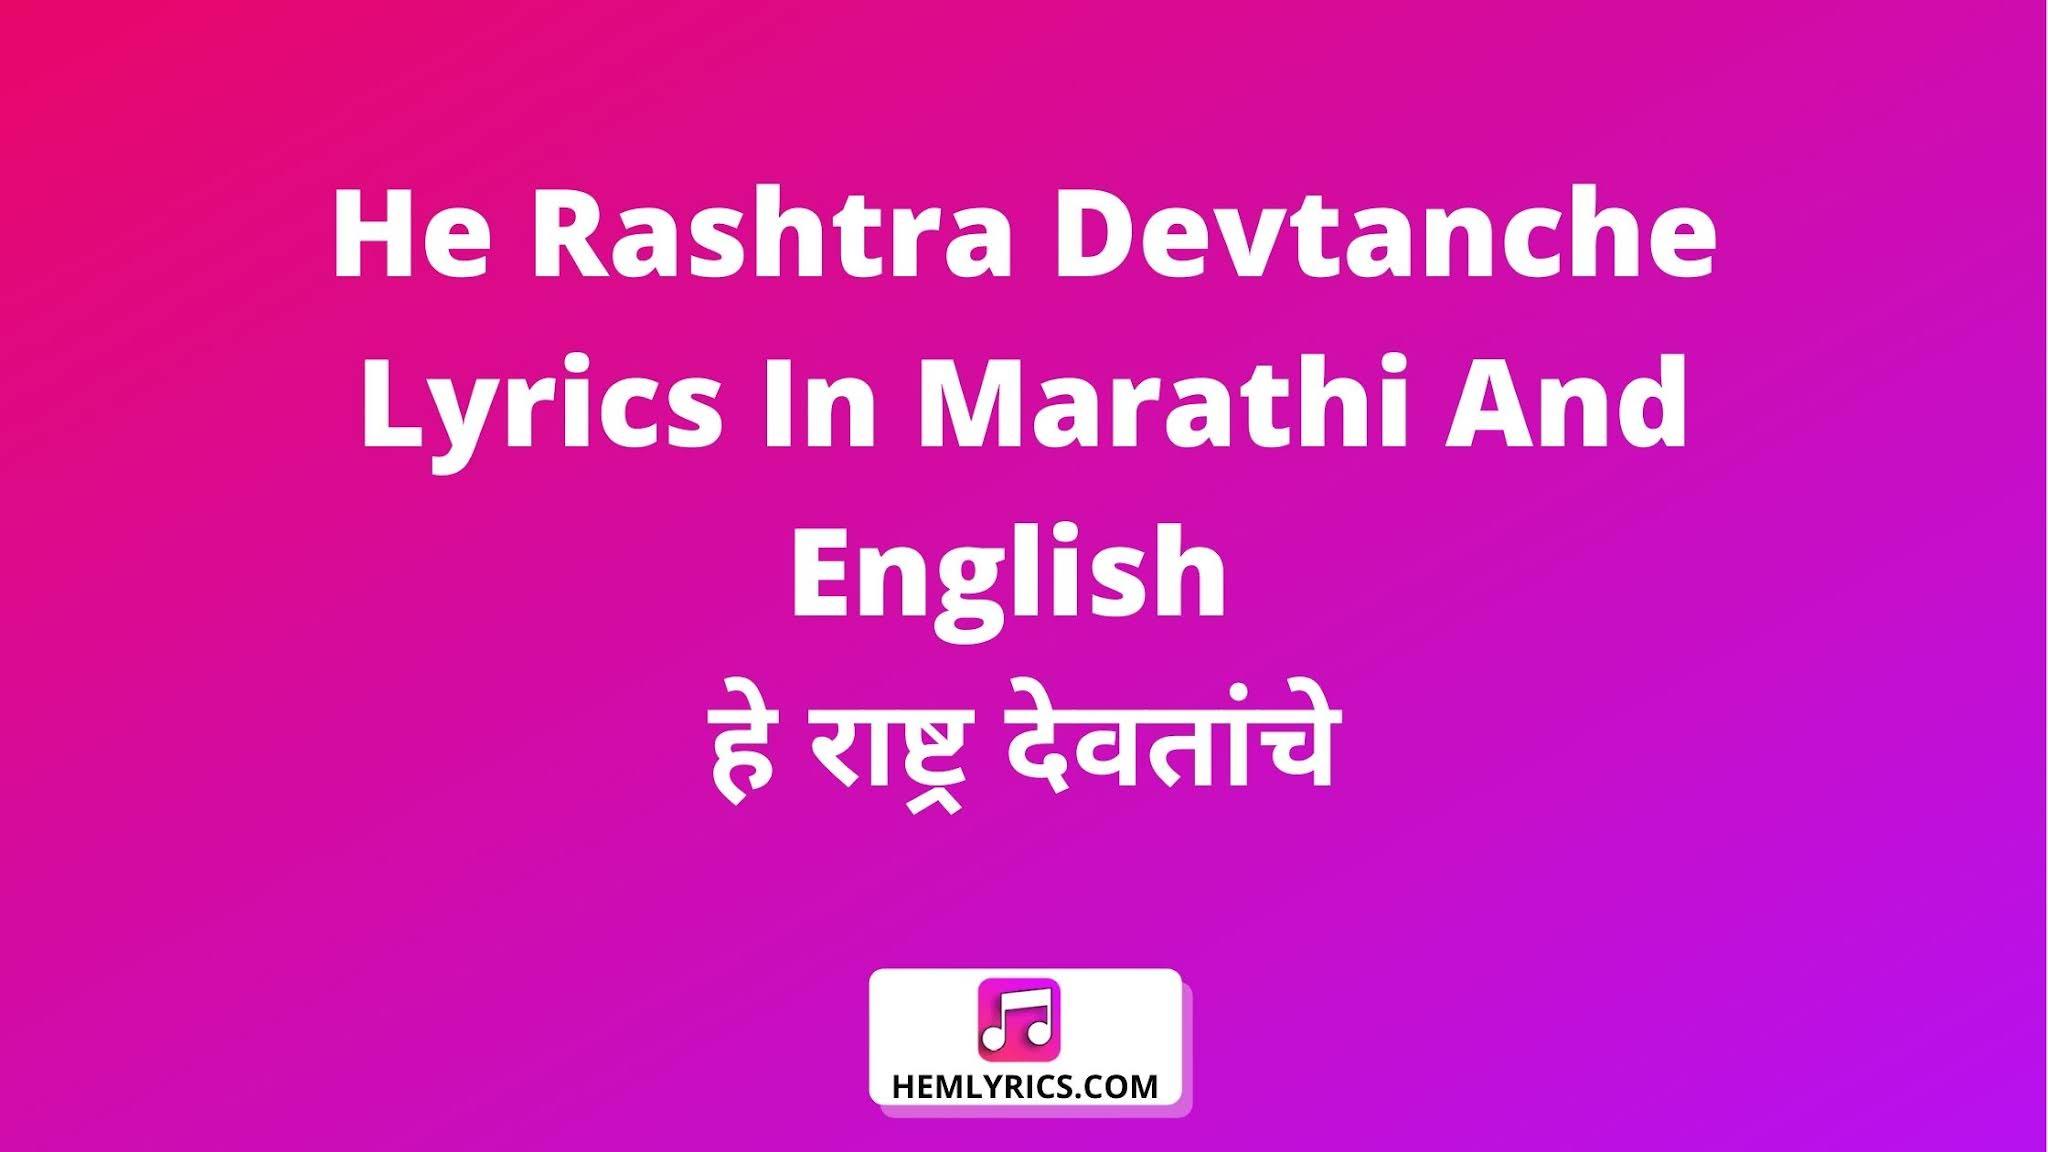 He Rashtra Devtanche Lyrics In Marathi And English - हे राष्ट्र देवतांचे